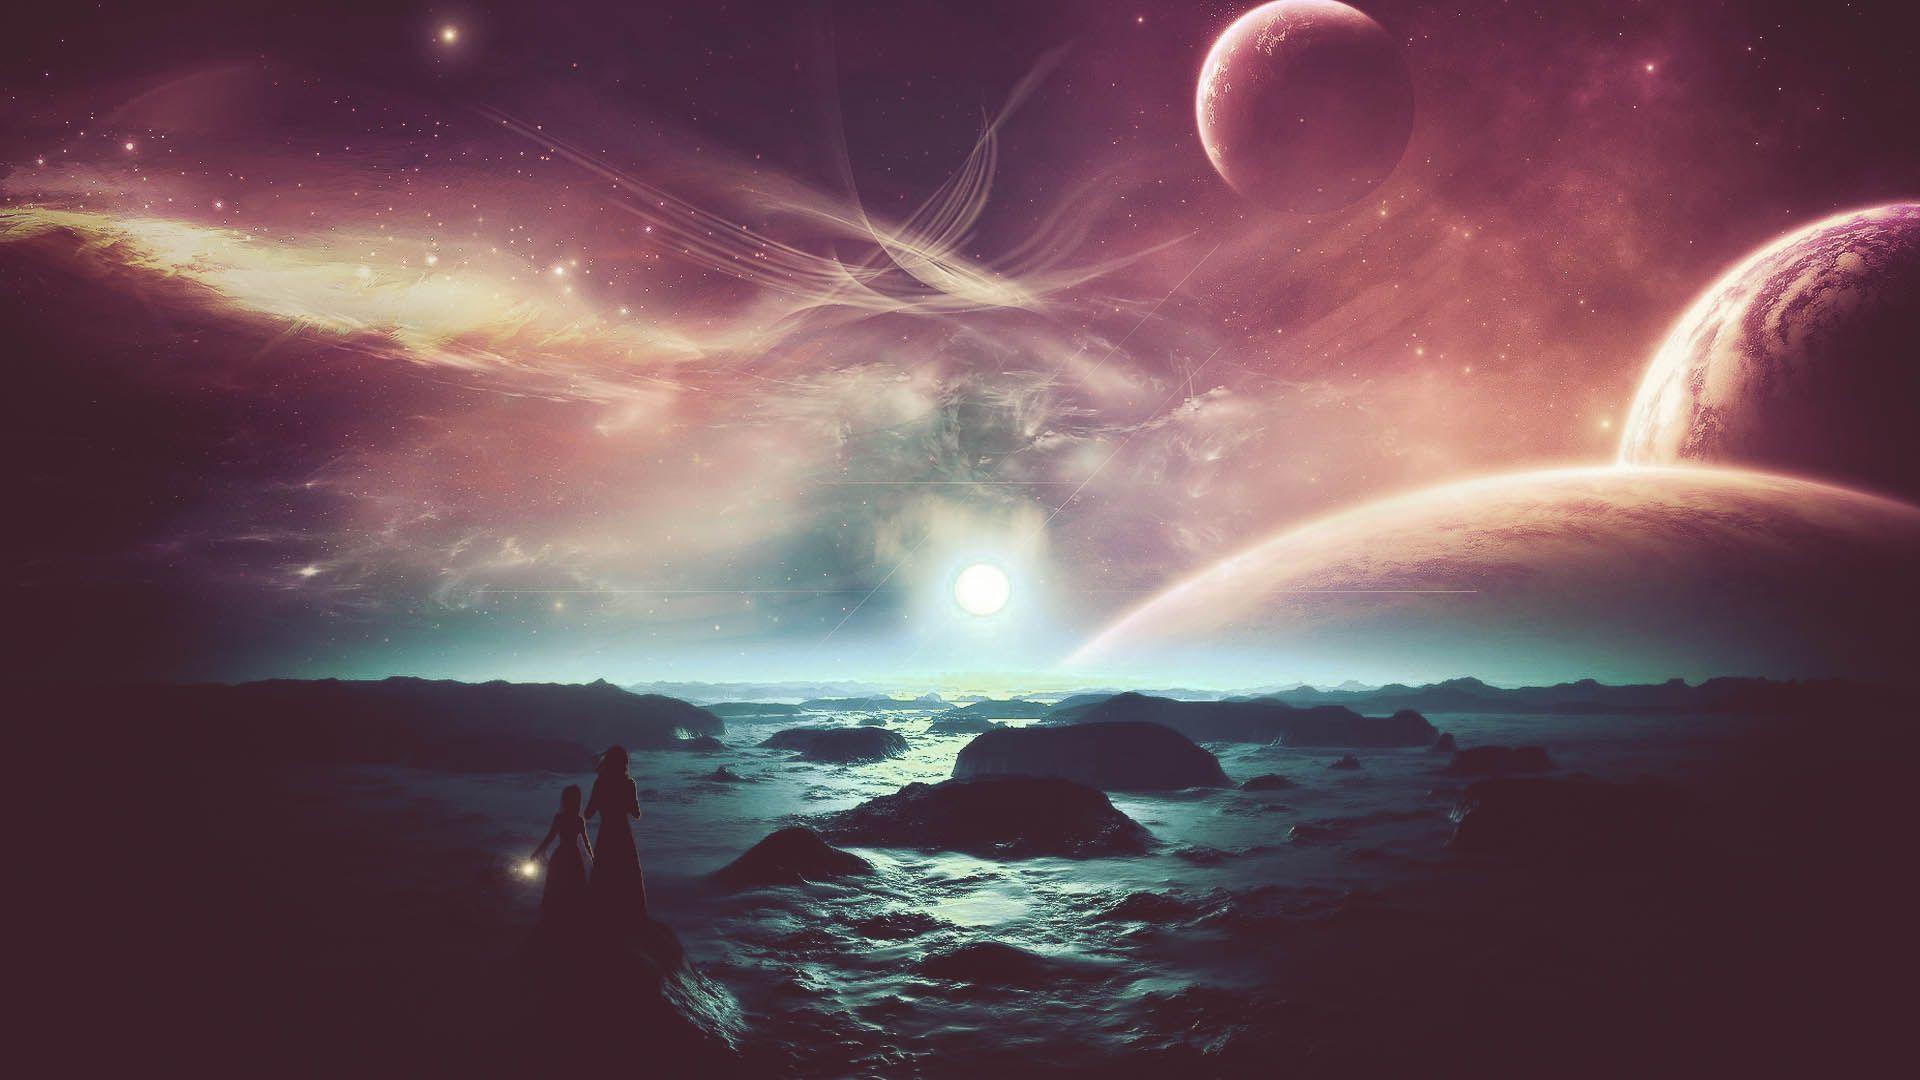 Alien landscape wallpaper thumb